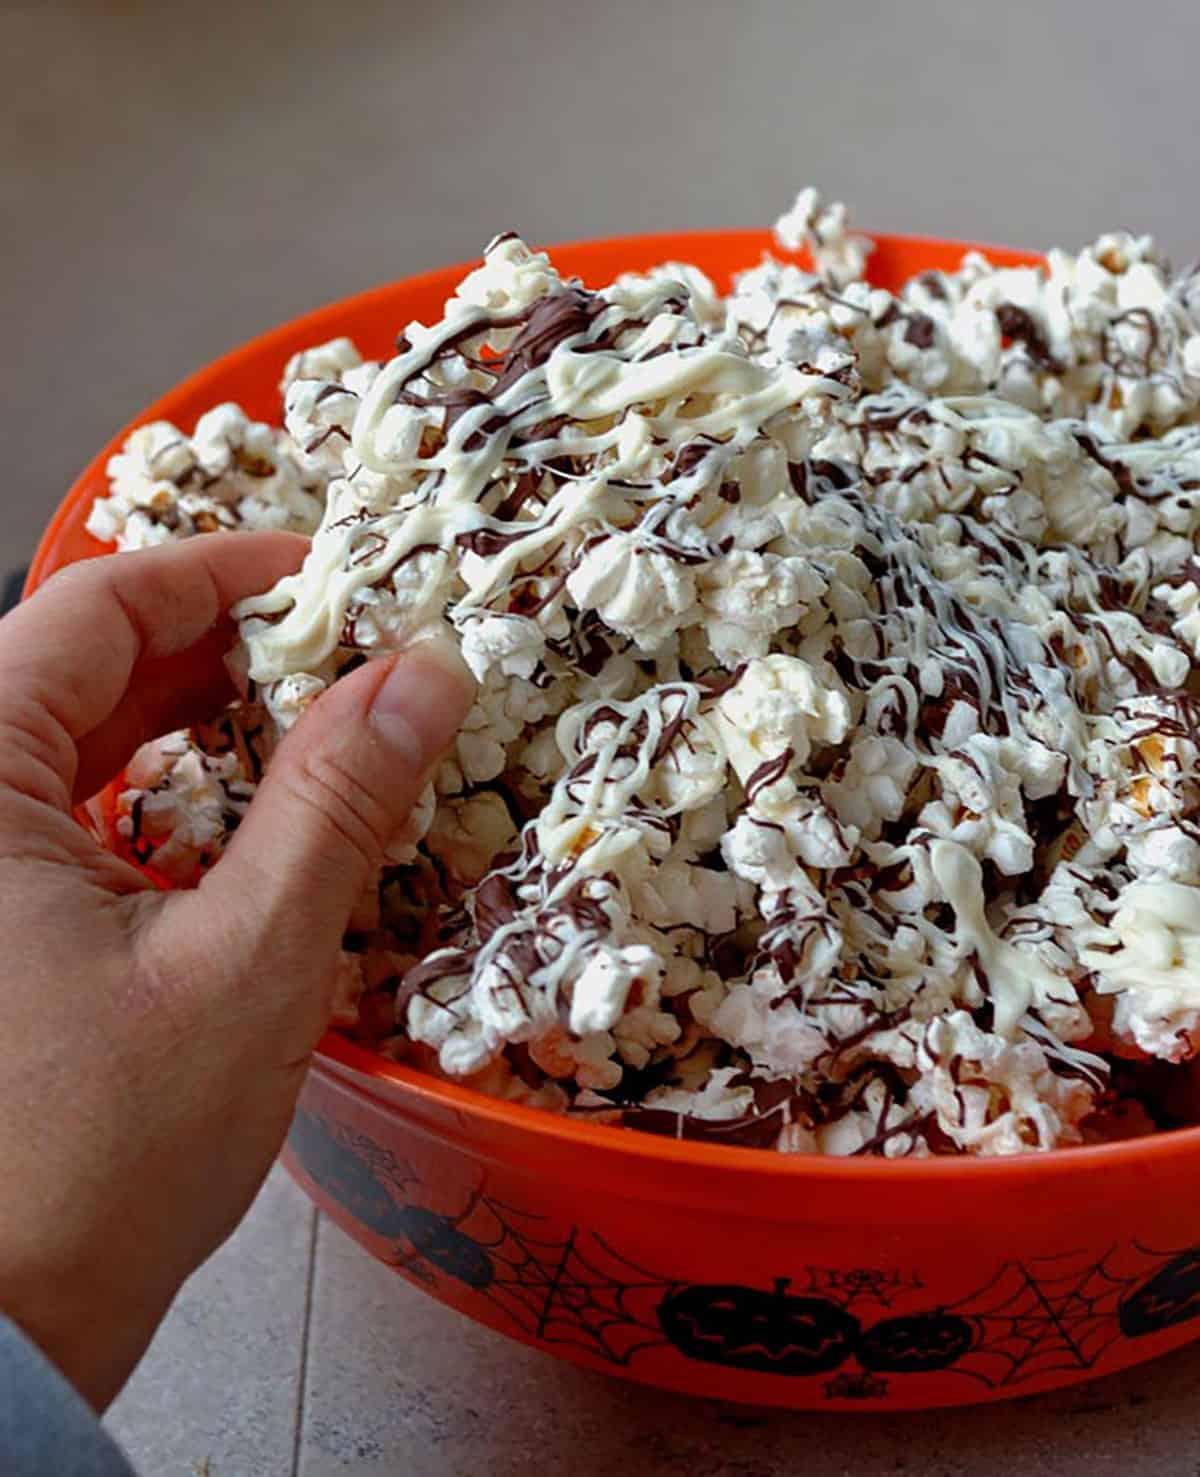 hand grabbing chocolate-covered popcorn from orange Halloween bowl